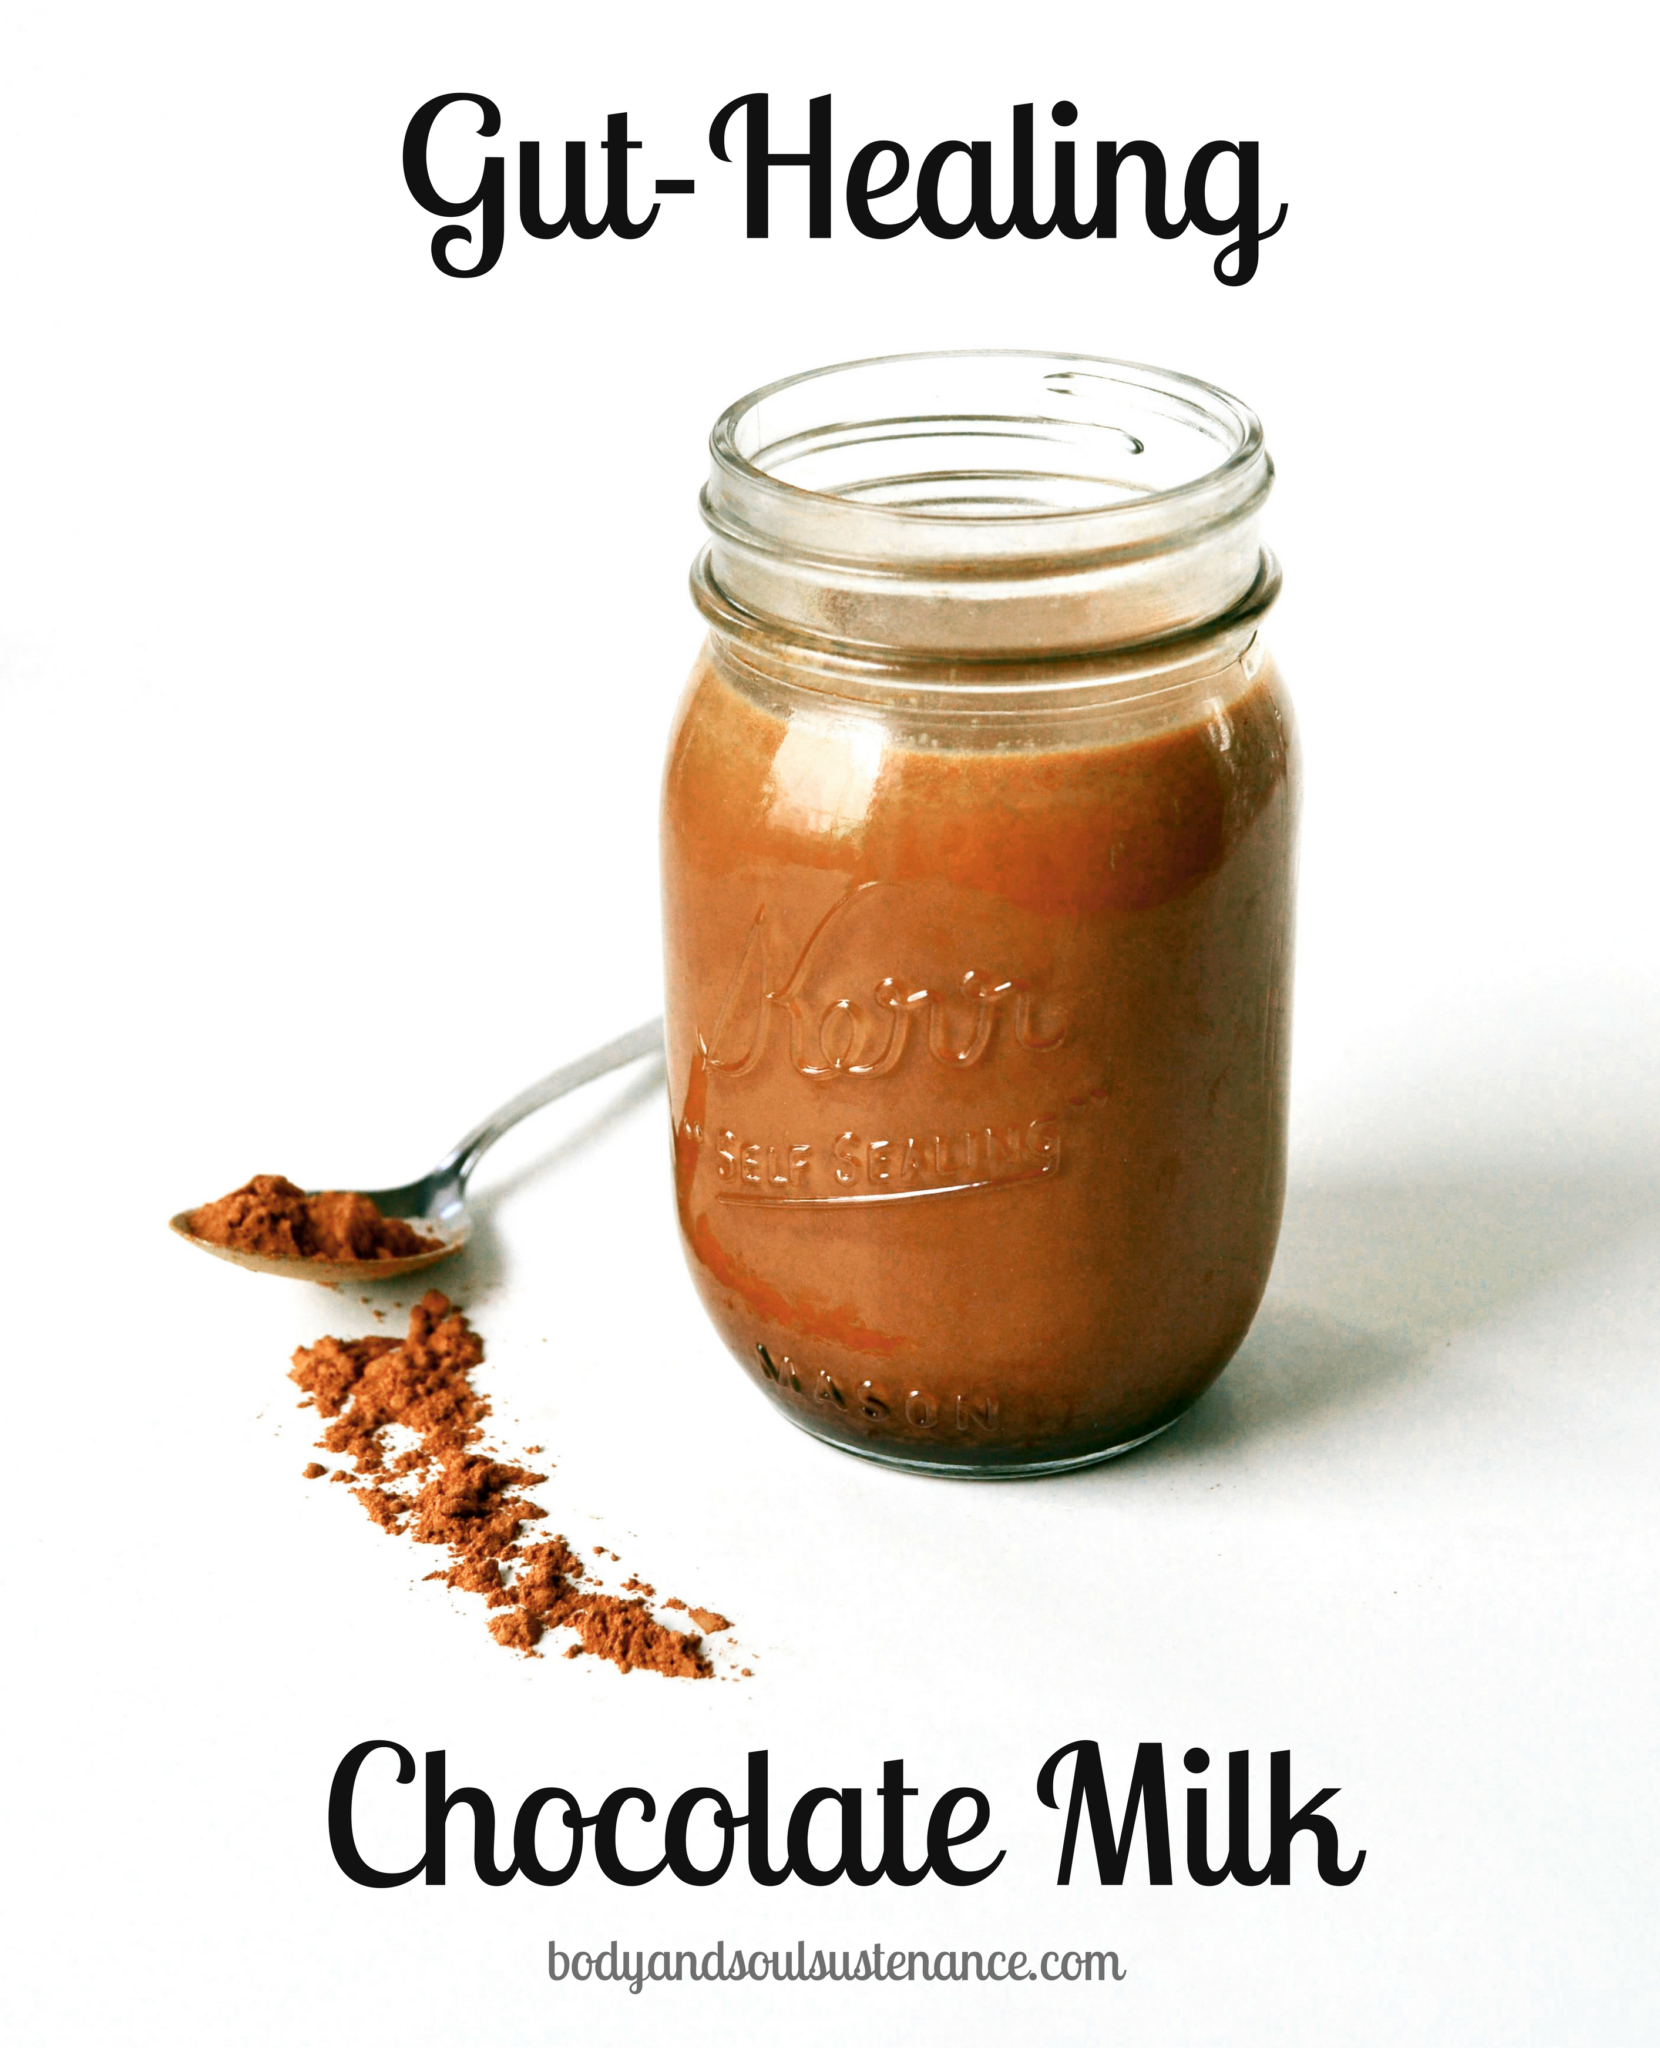 Gut-Healing Chocolate Milk | Body & Soul Sustenance